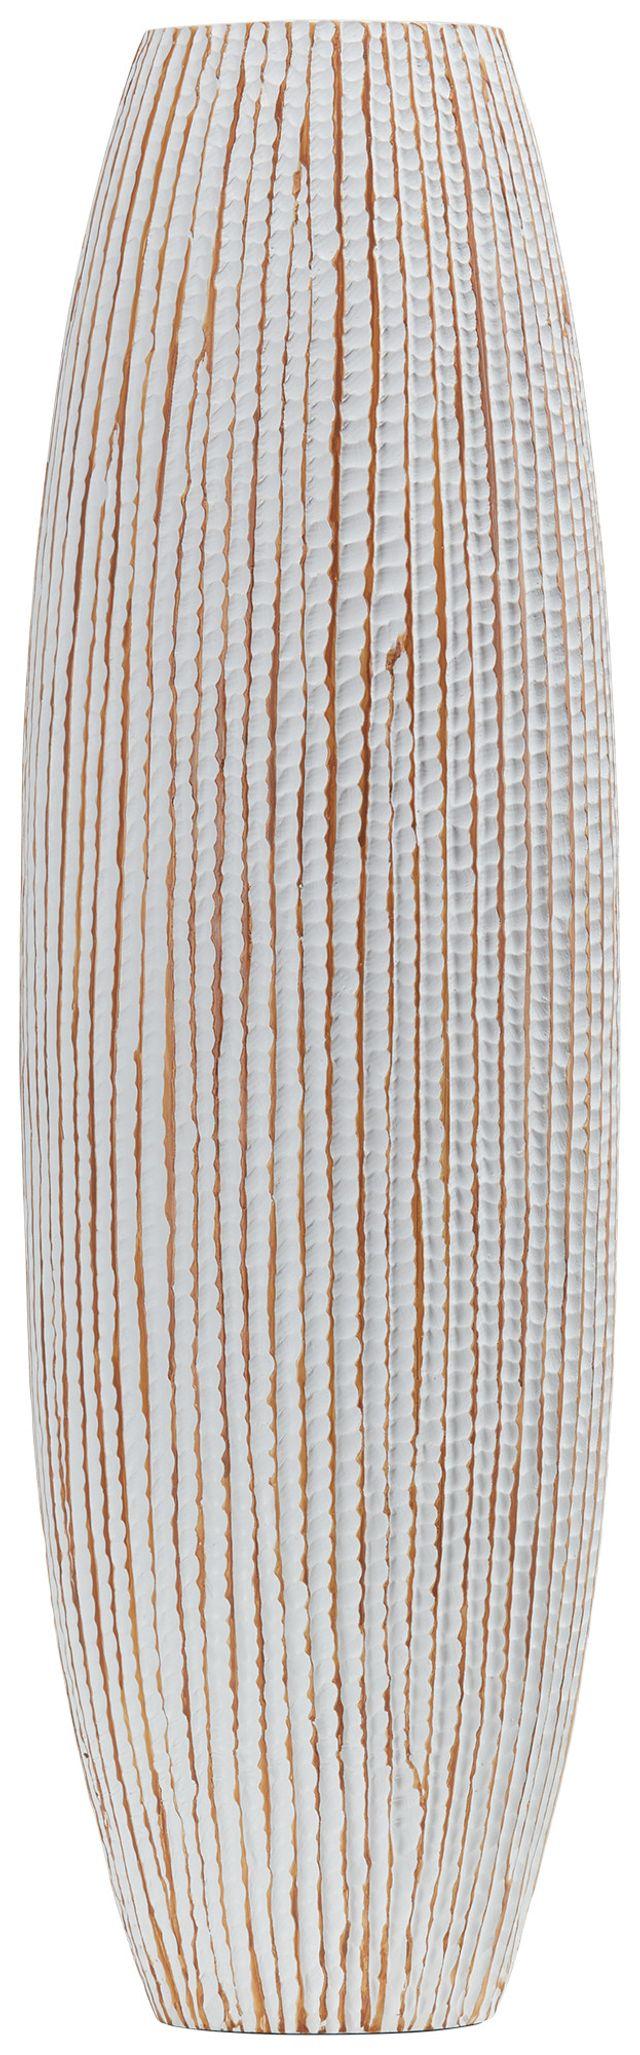 Harper Beige Vase (0)